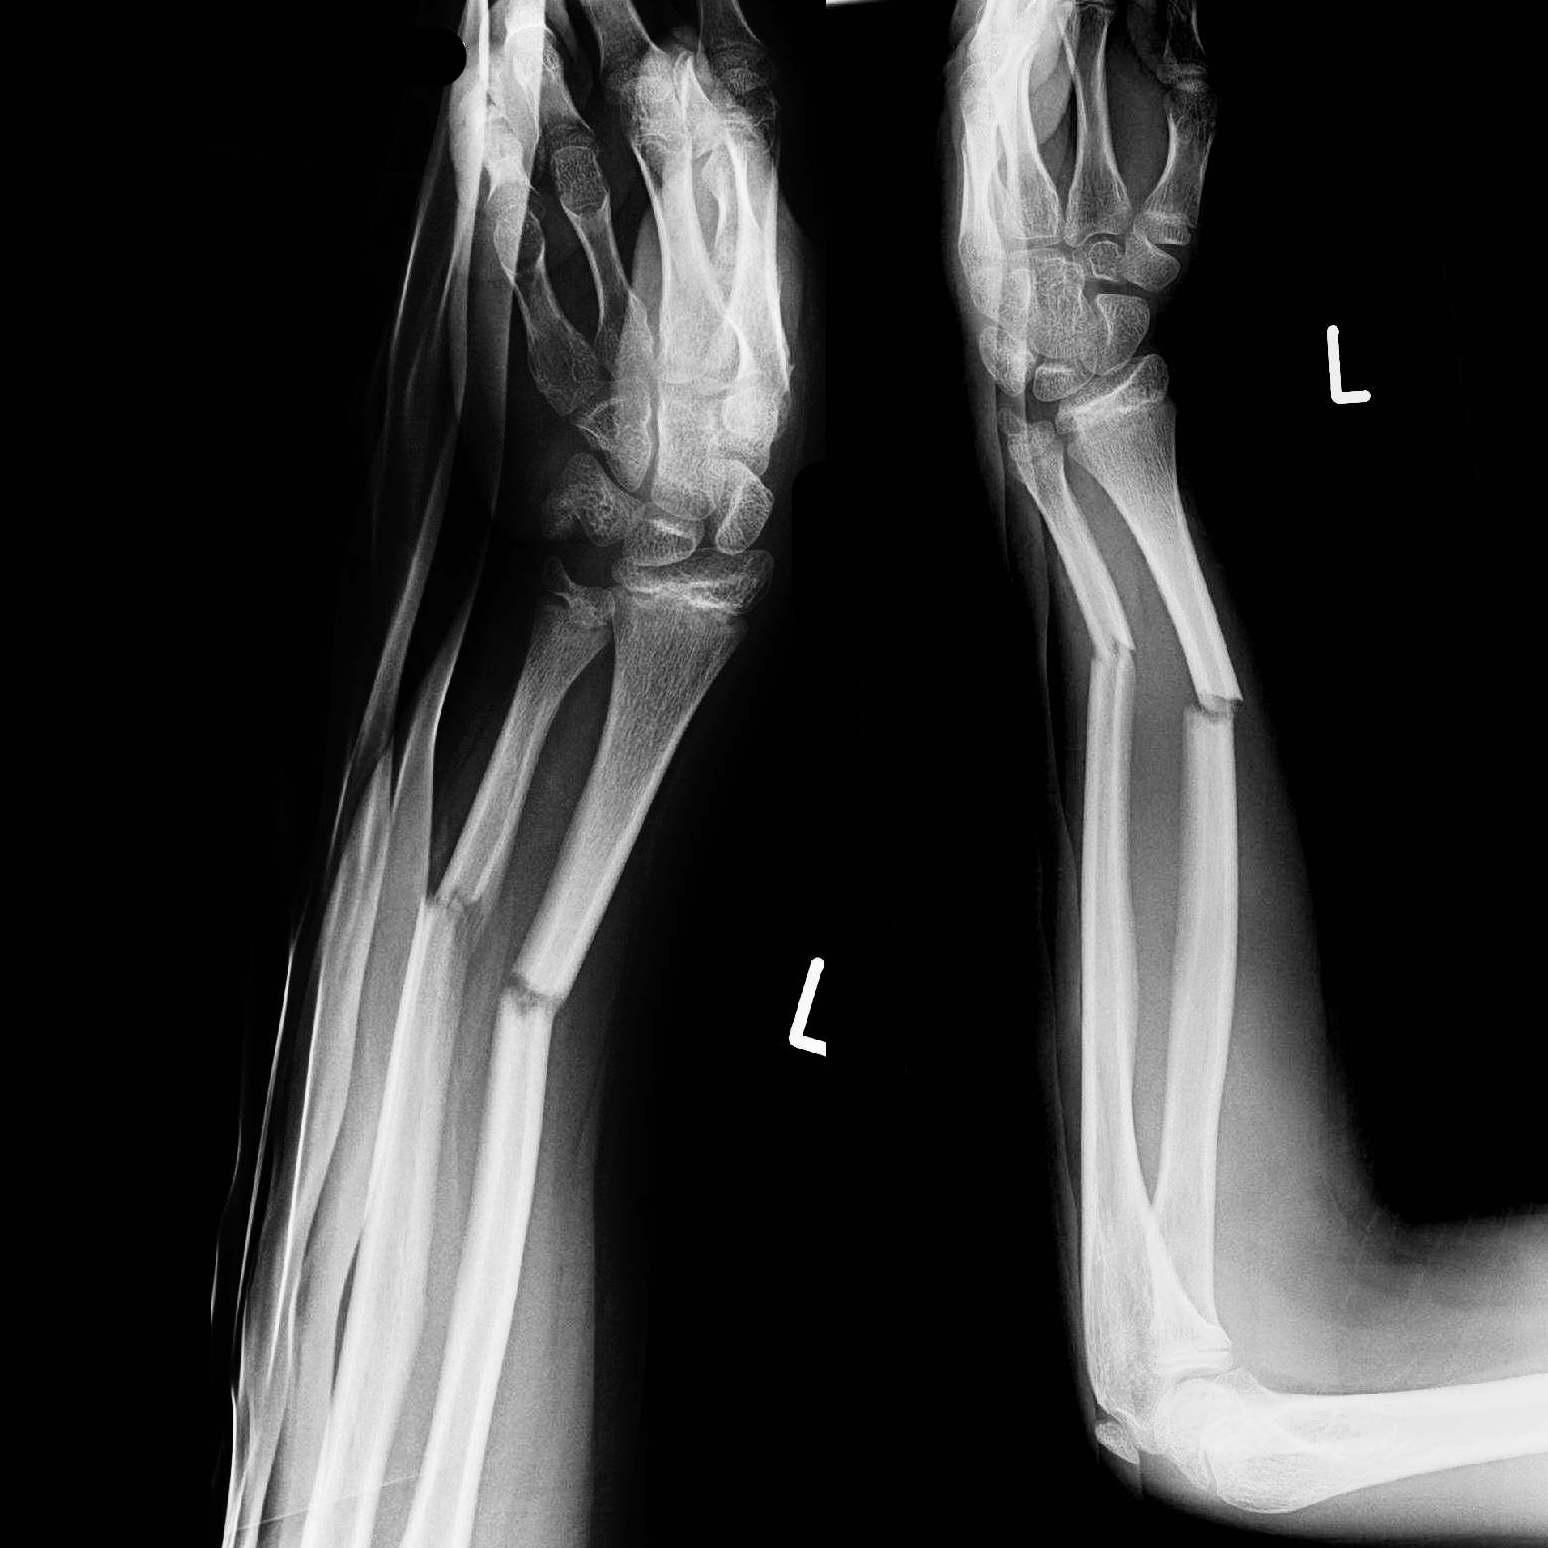 Dog Foot Bone Video